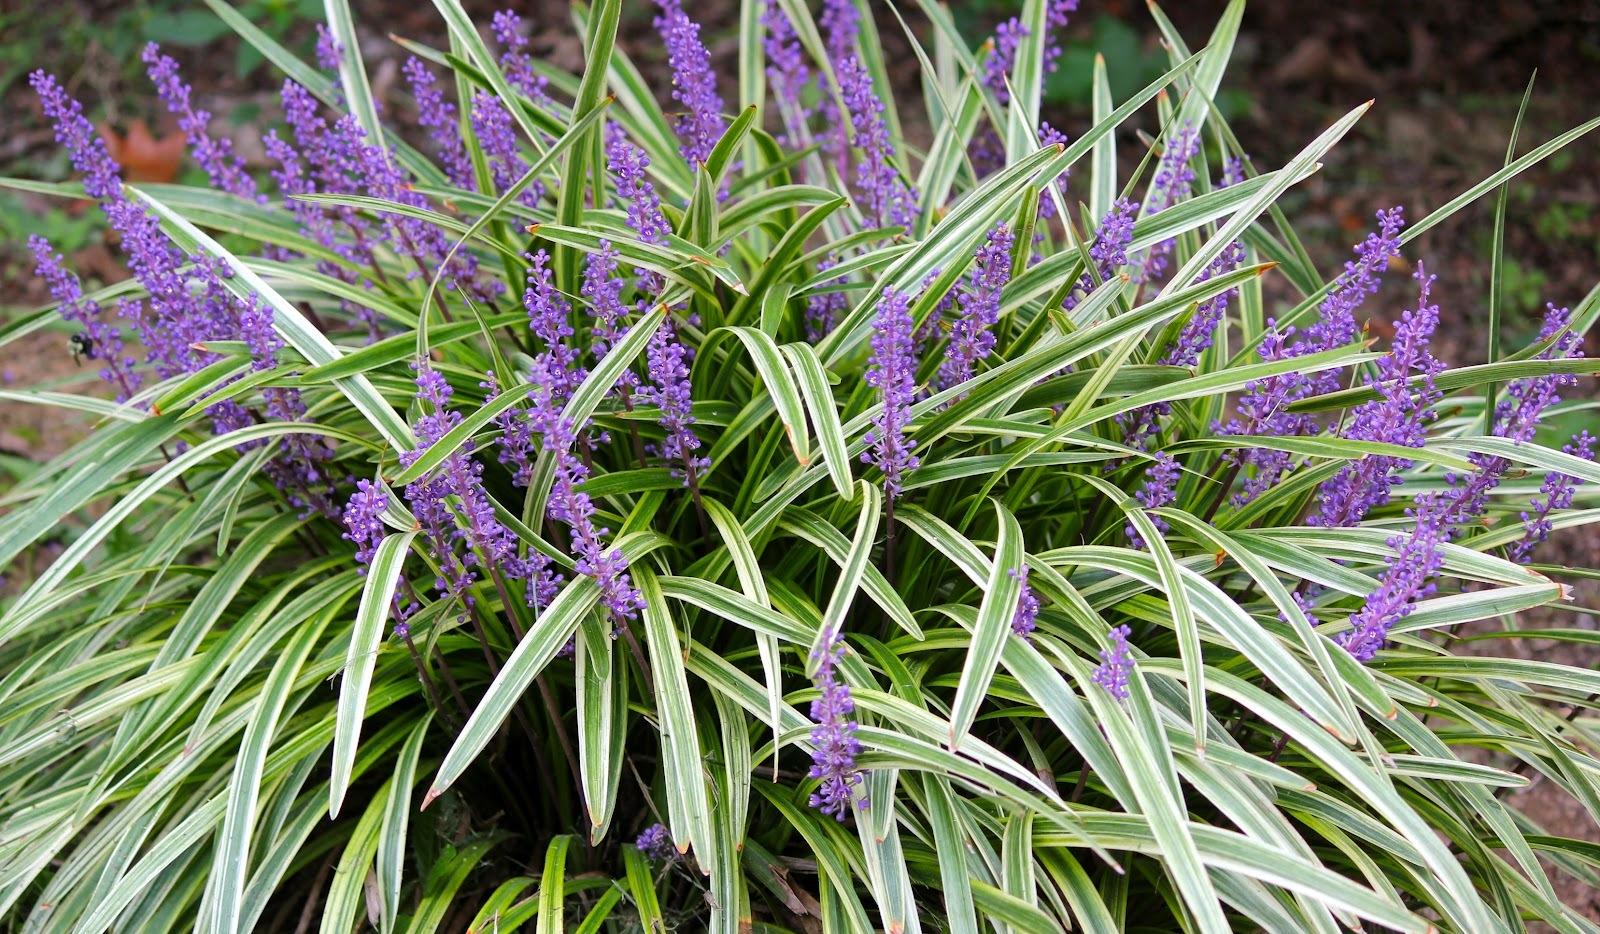 Variegated Liriope Grass